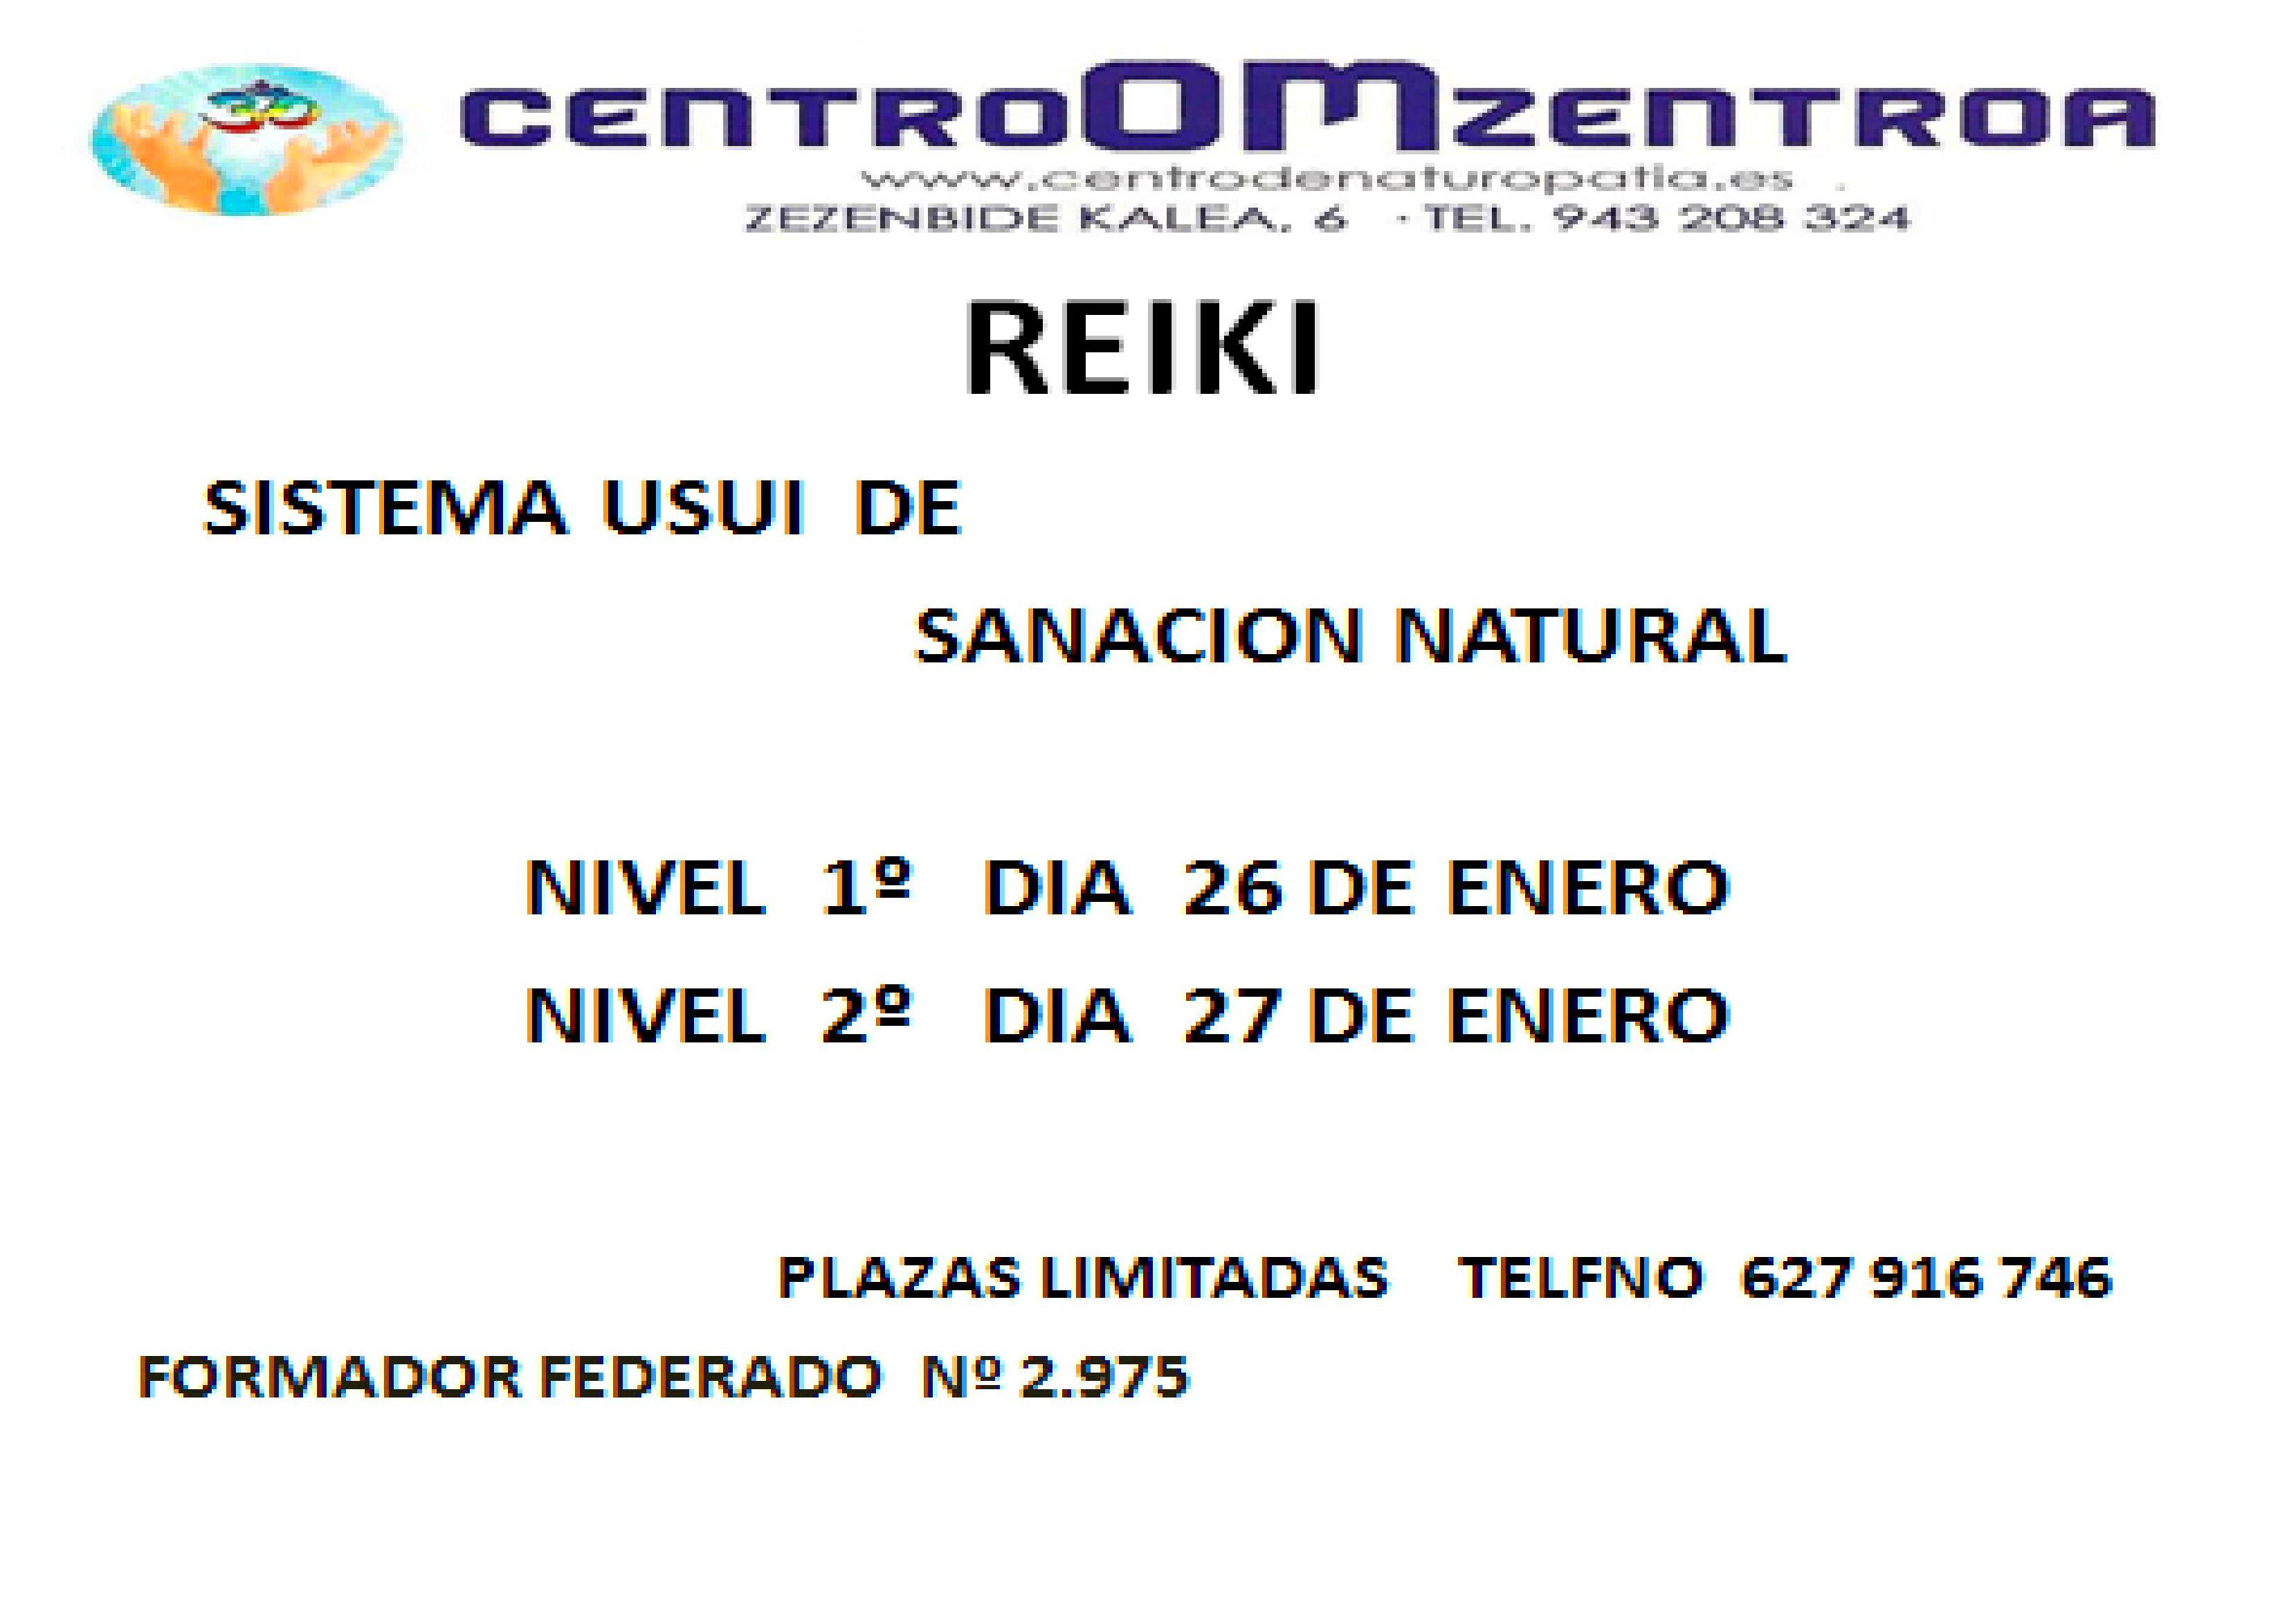 CHUDEN,   2º  Nivel de Reiki,  en Eibar  ENERO